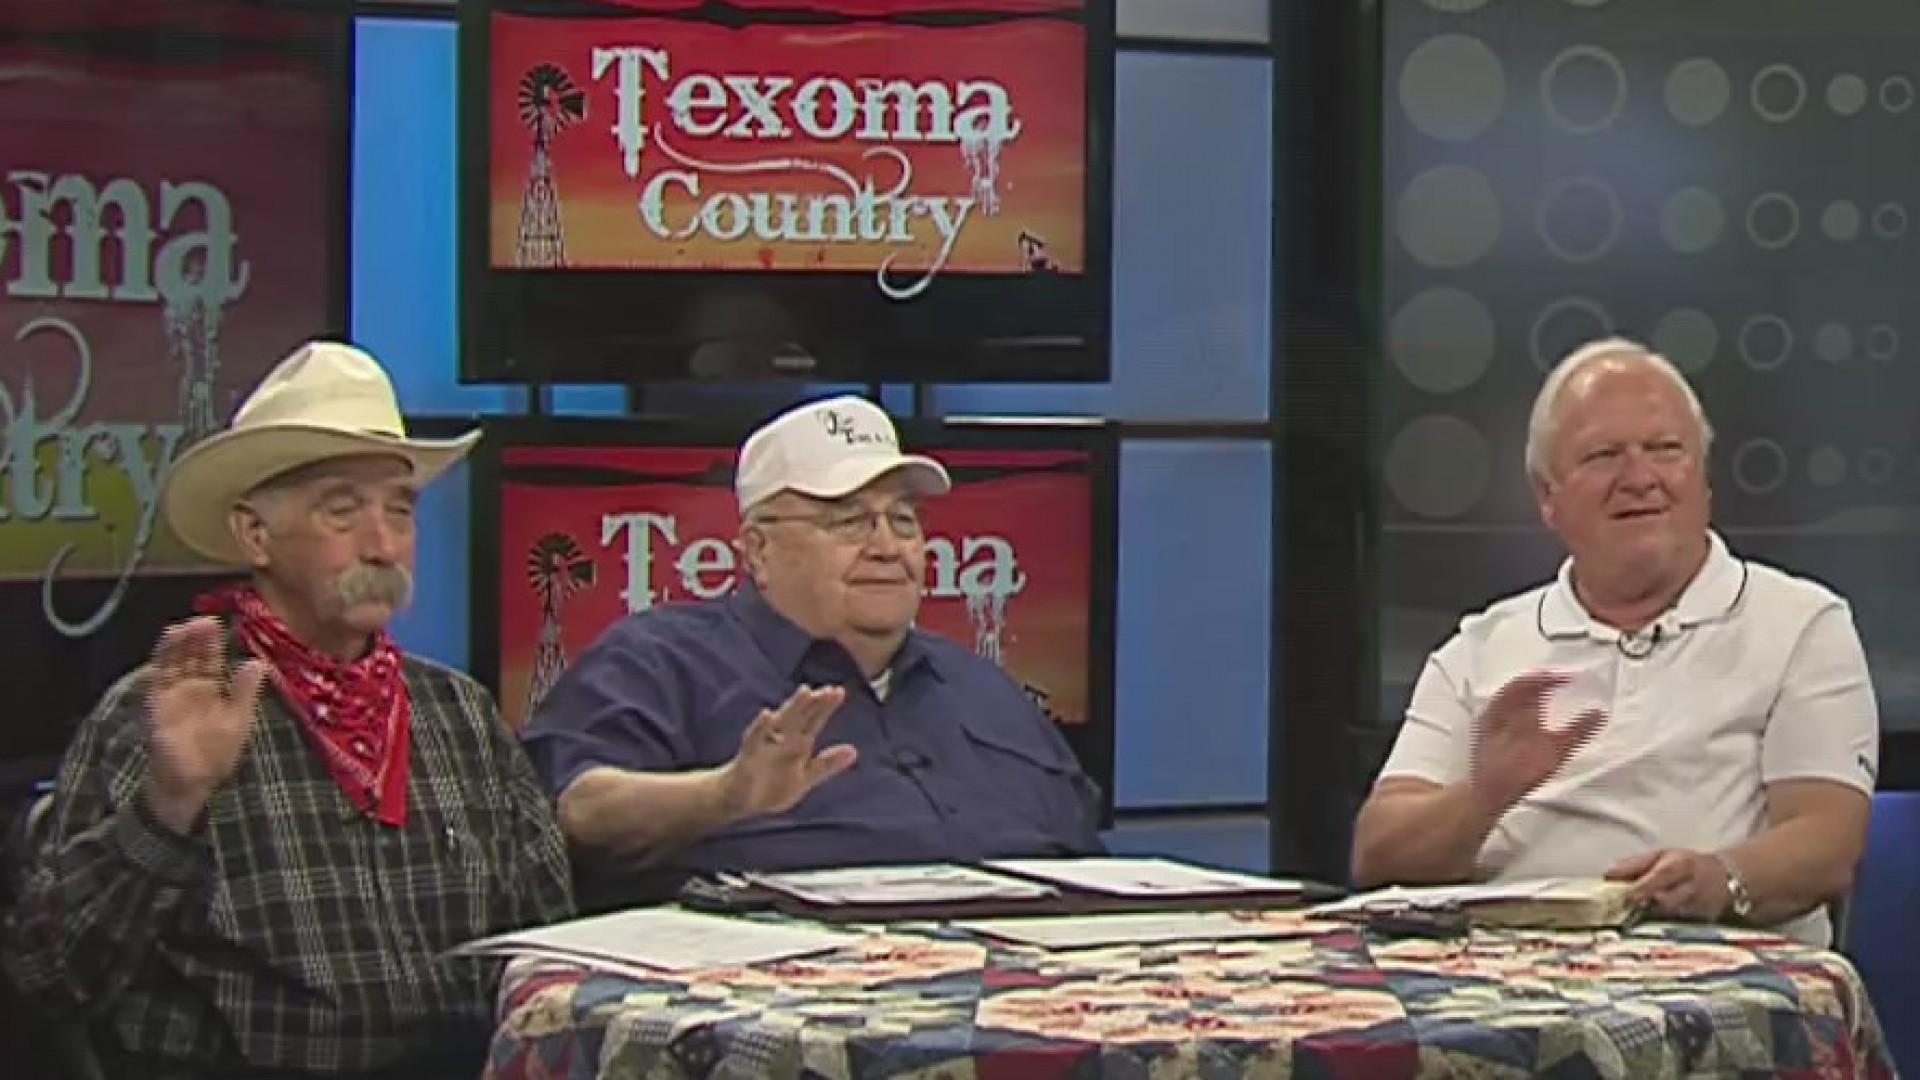 Texoma Country Morning 9/6/18 4